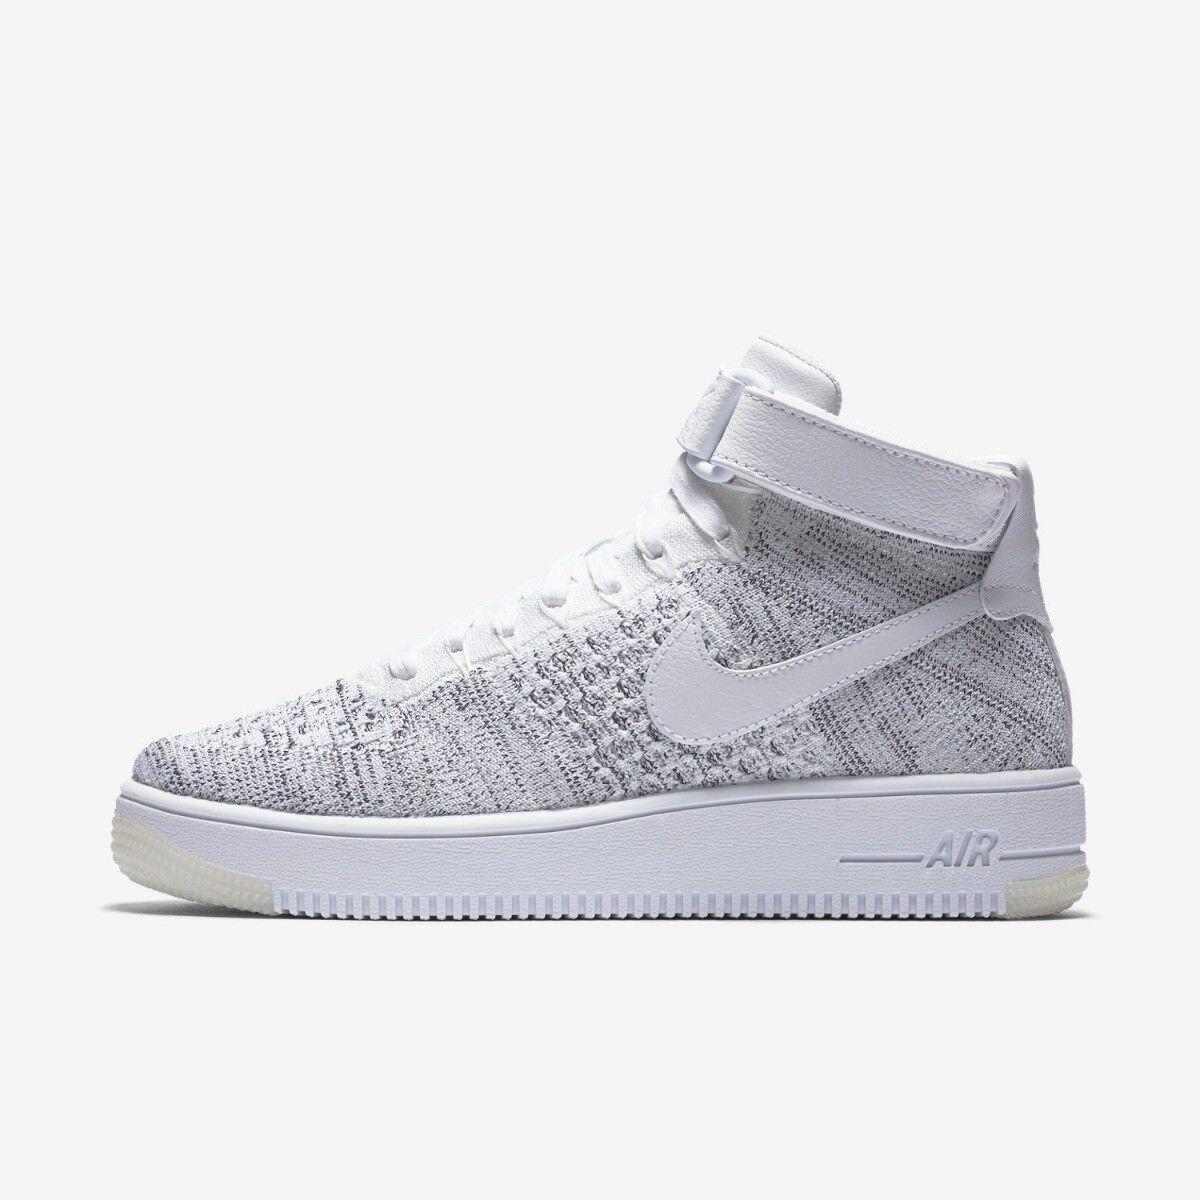 Nike AF1 Flyknit Womens Hi top Trainer Shoe Size 3.5 White Black RRP £115/- 884726396469